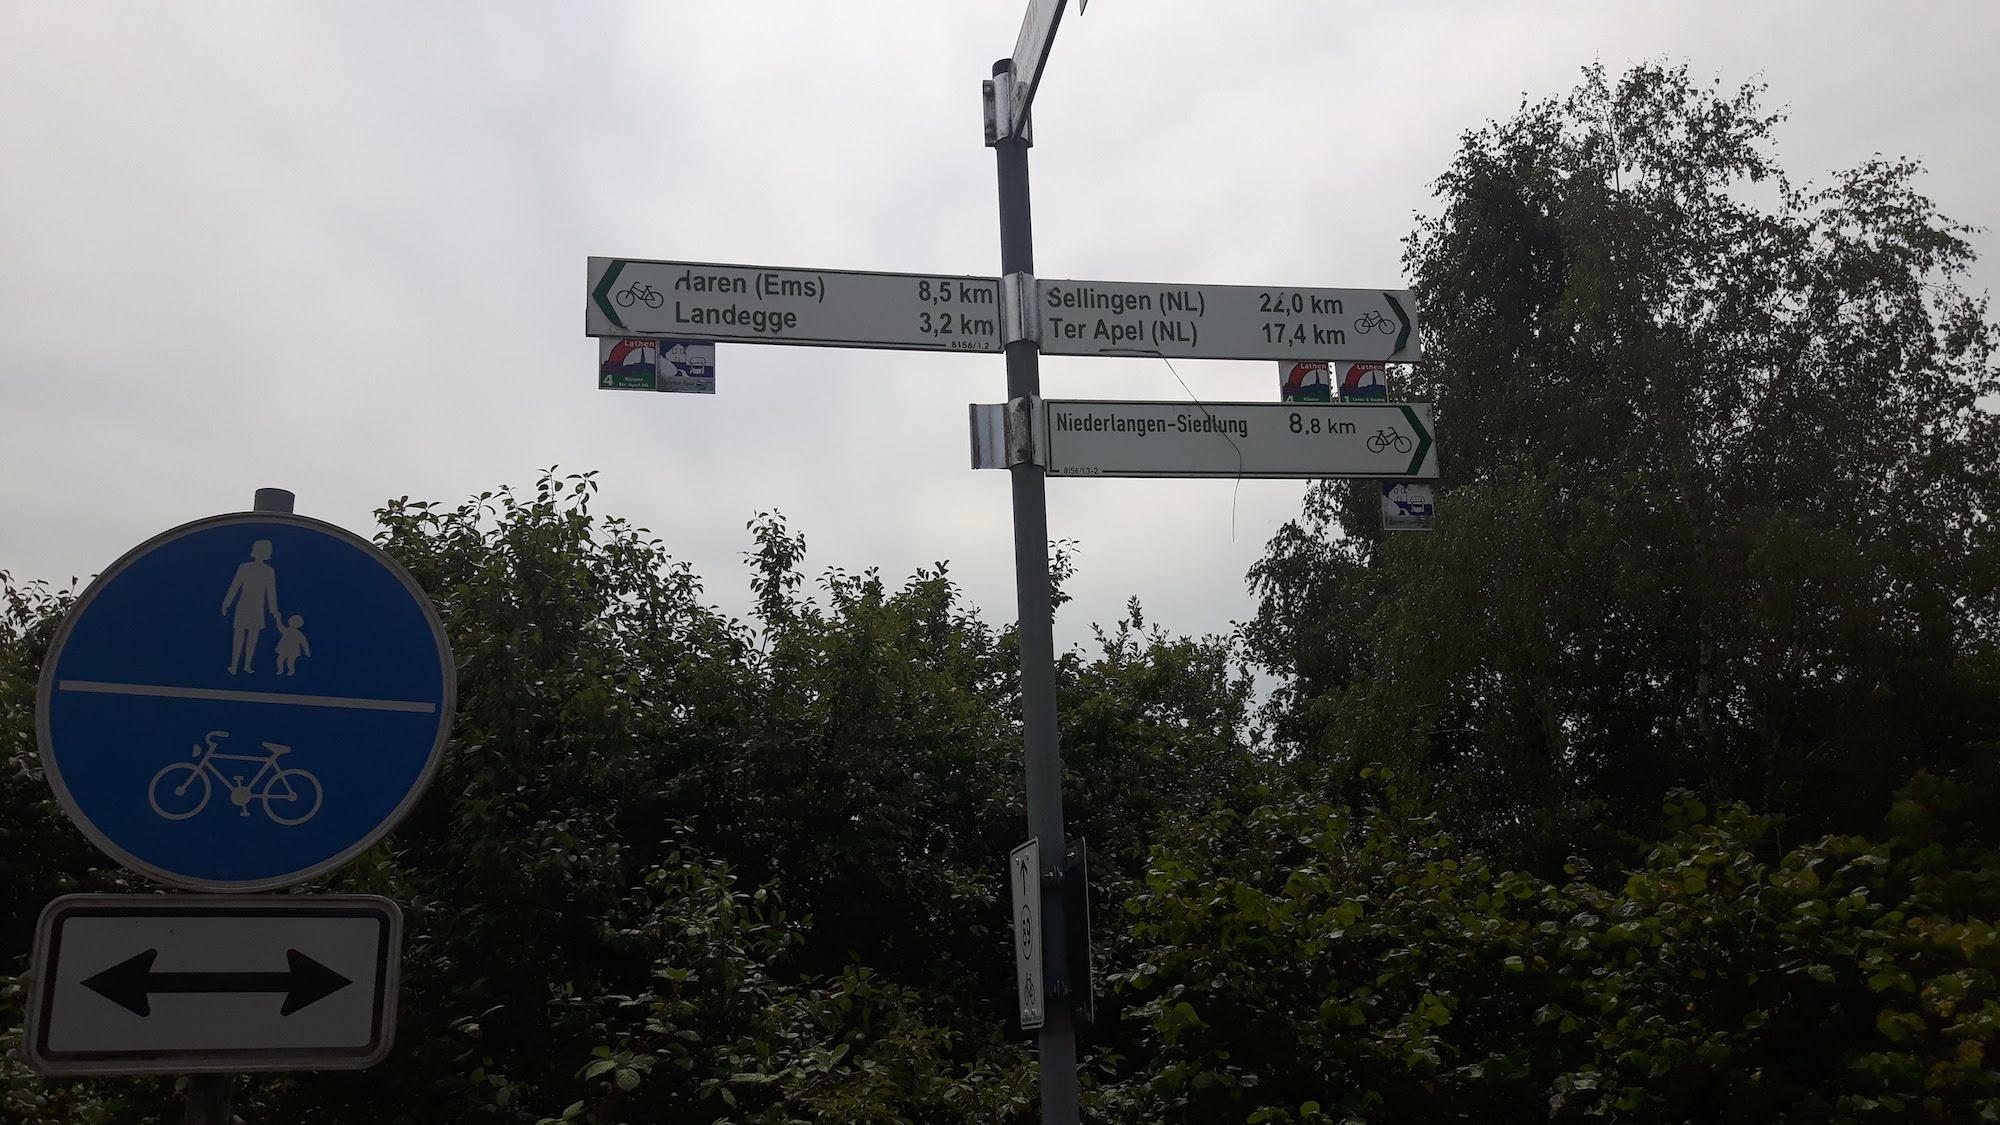 Towards Netherlands in Germany